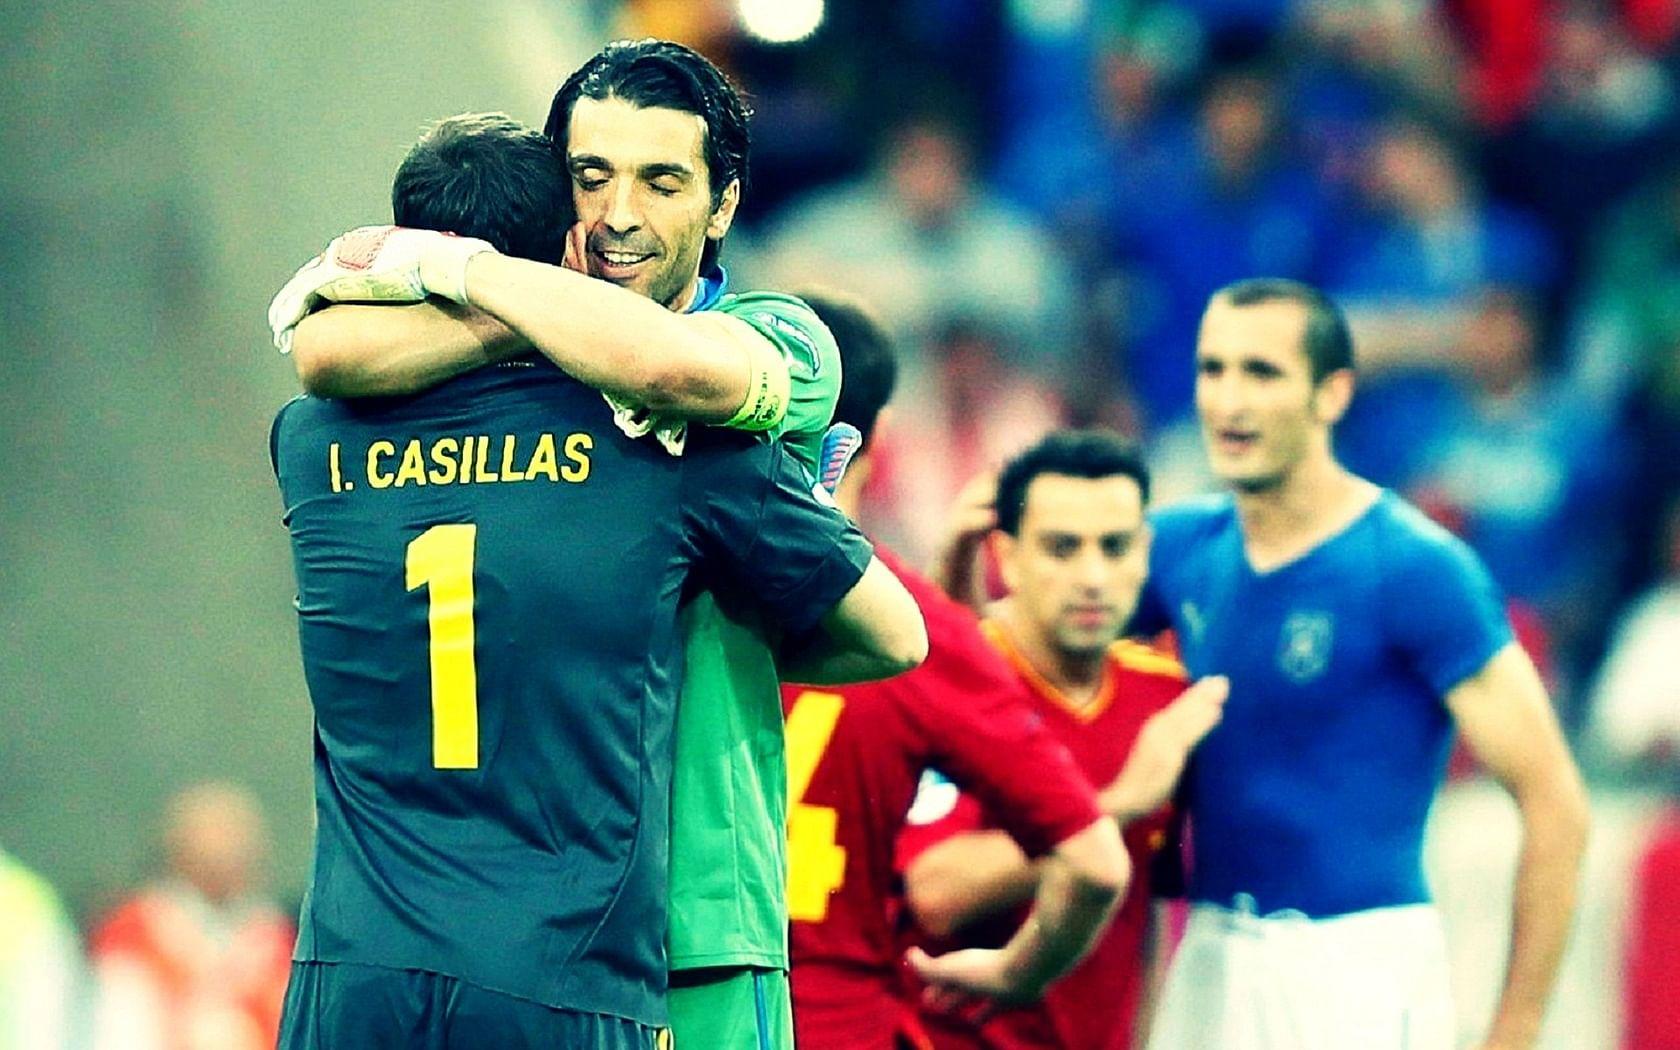 Iker Casillas vs Gianluigi Buffon - Who has been the best goalkeeper of the outgoing generation?